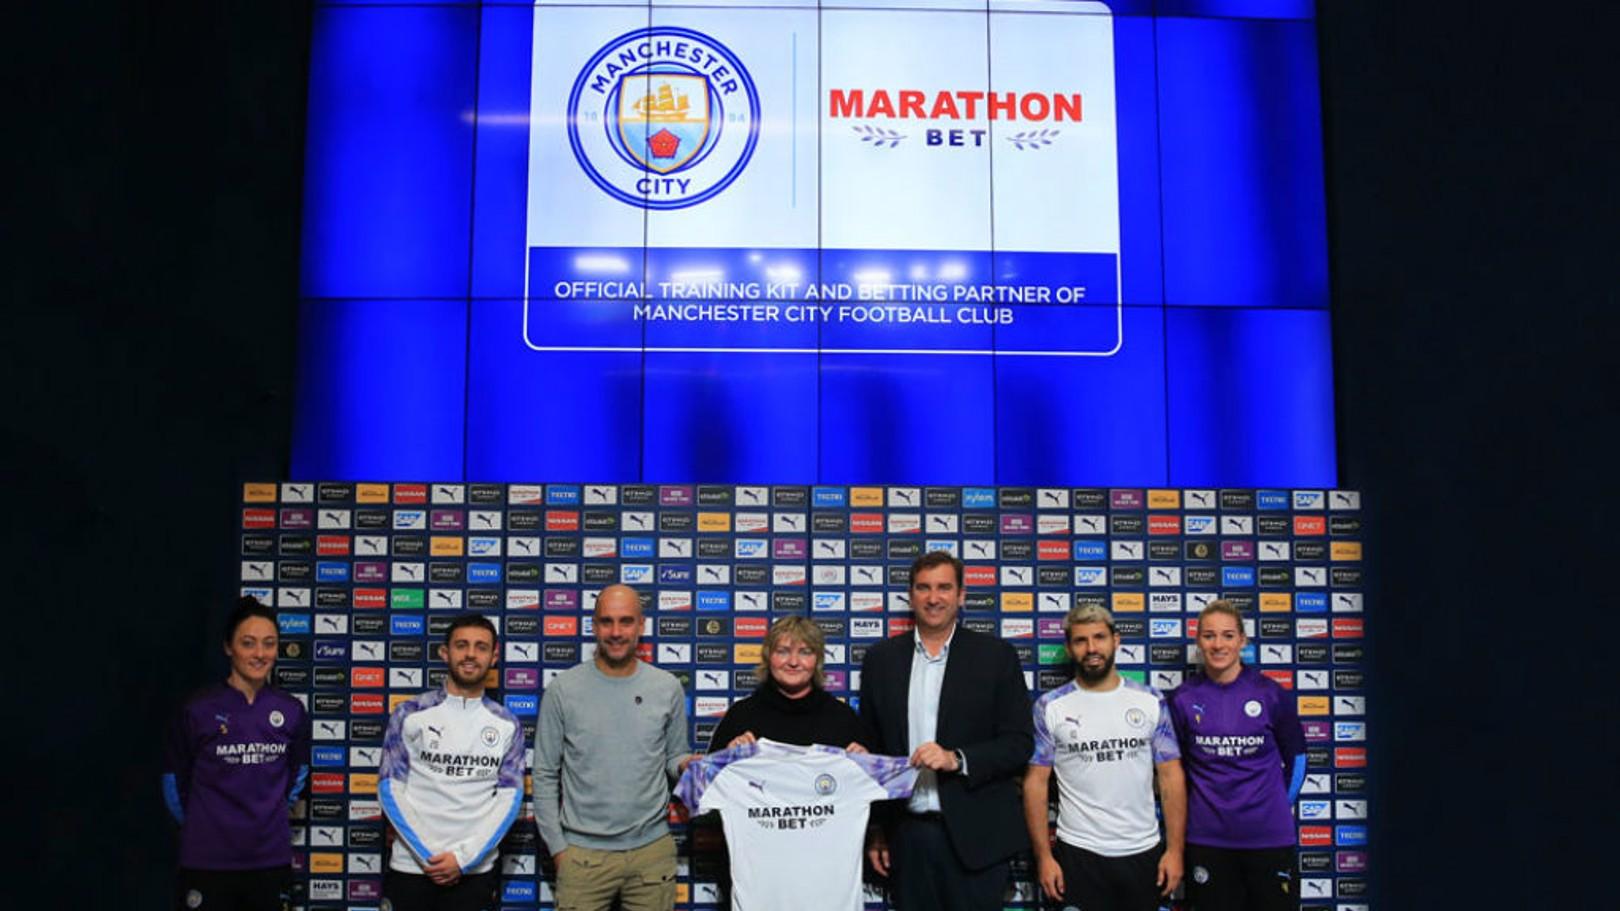 Marathonbet become City's training kit partner